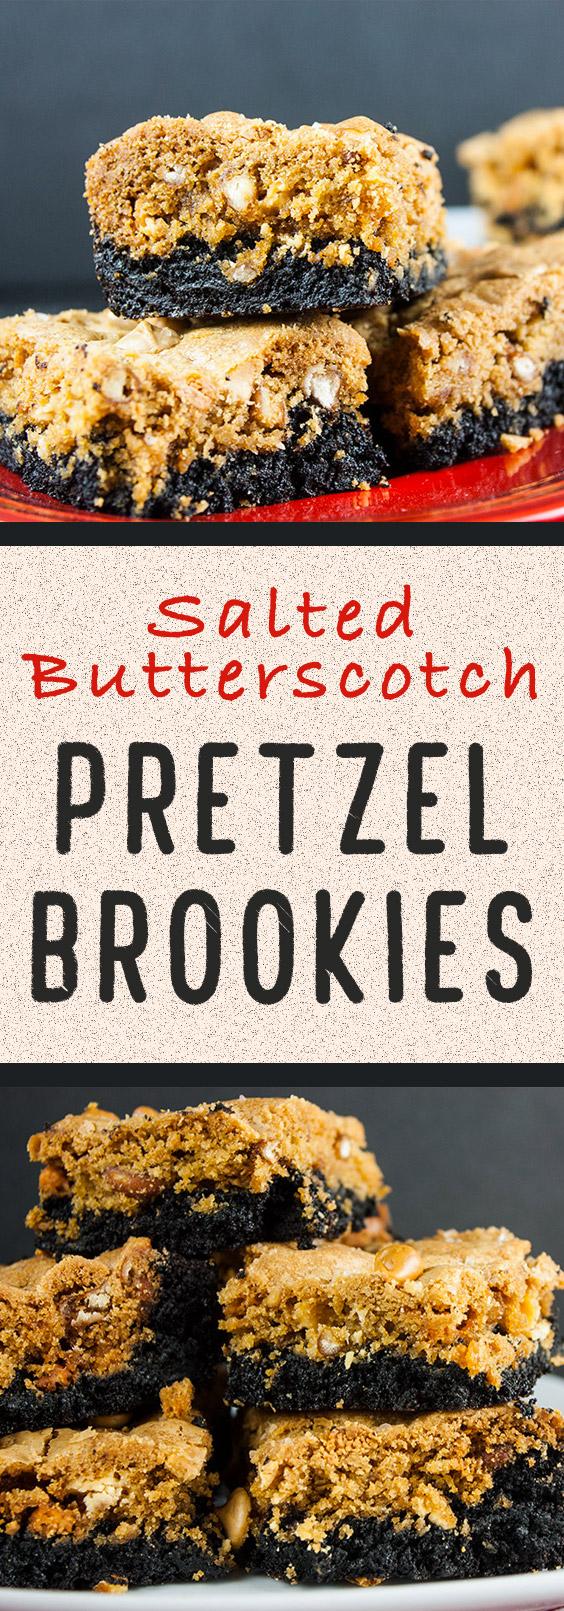 Salted Butterscotch Pretzel Brookies - Dark chocolate brownie topped with butterscotch pretzel cookie. The best of both worlds all in one bar!